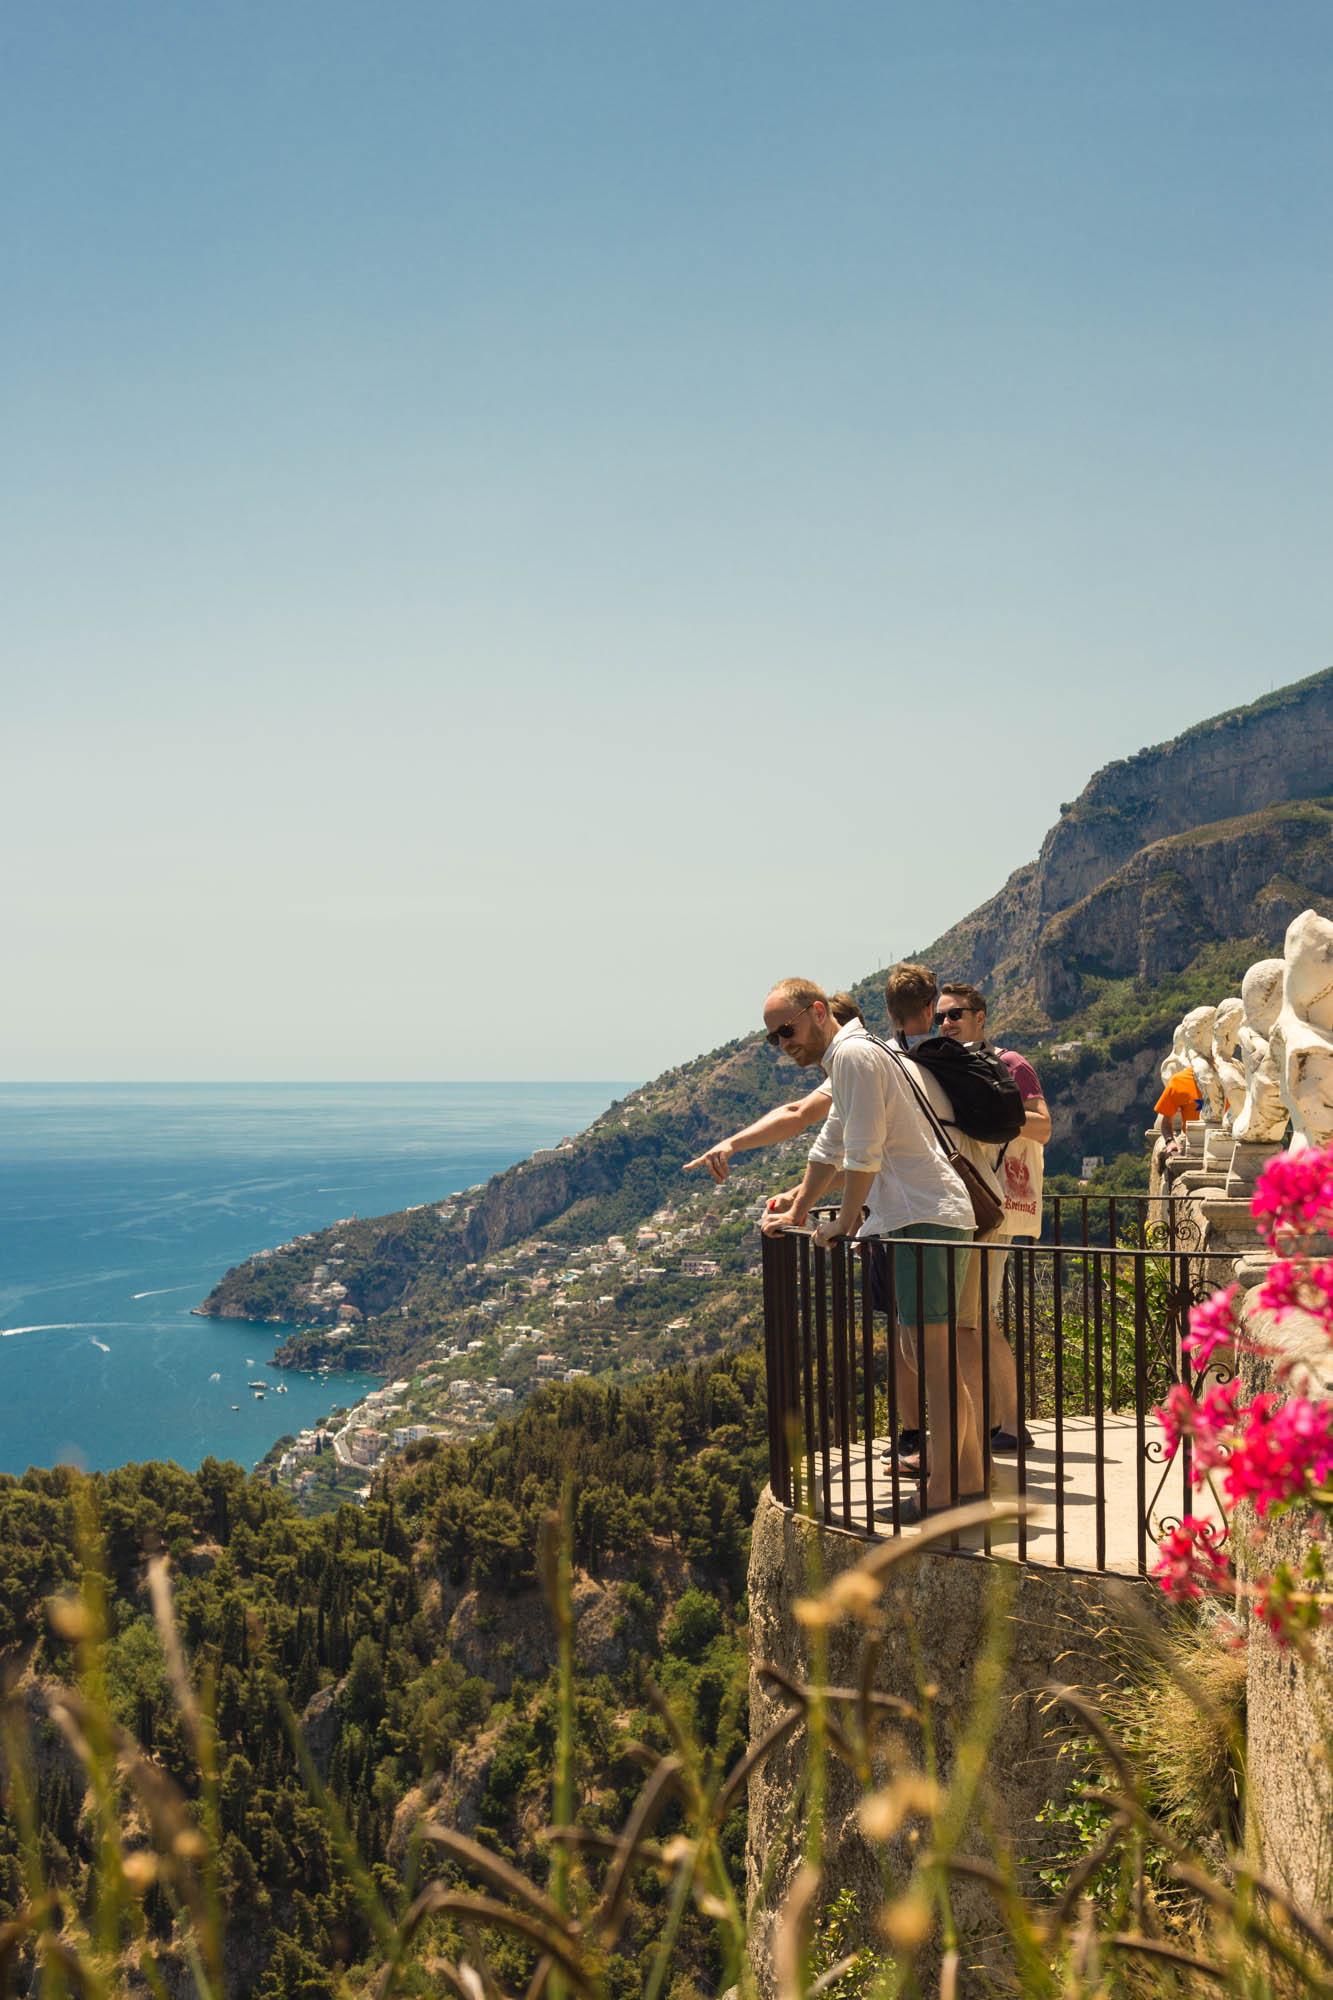 Roadtripping the Amalfi coast – Ravello Villa Cimbrone Gardens